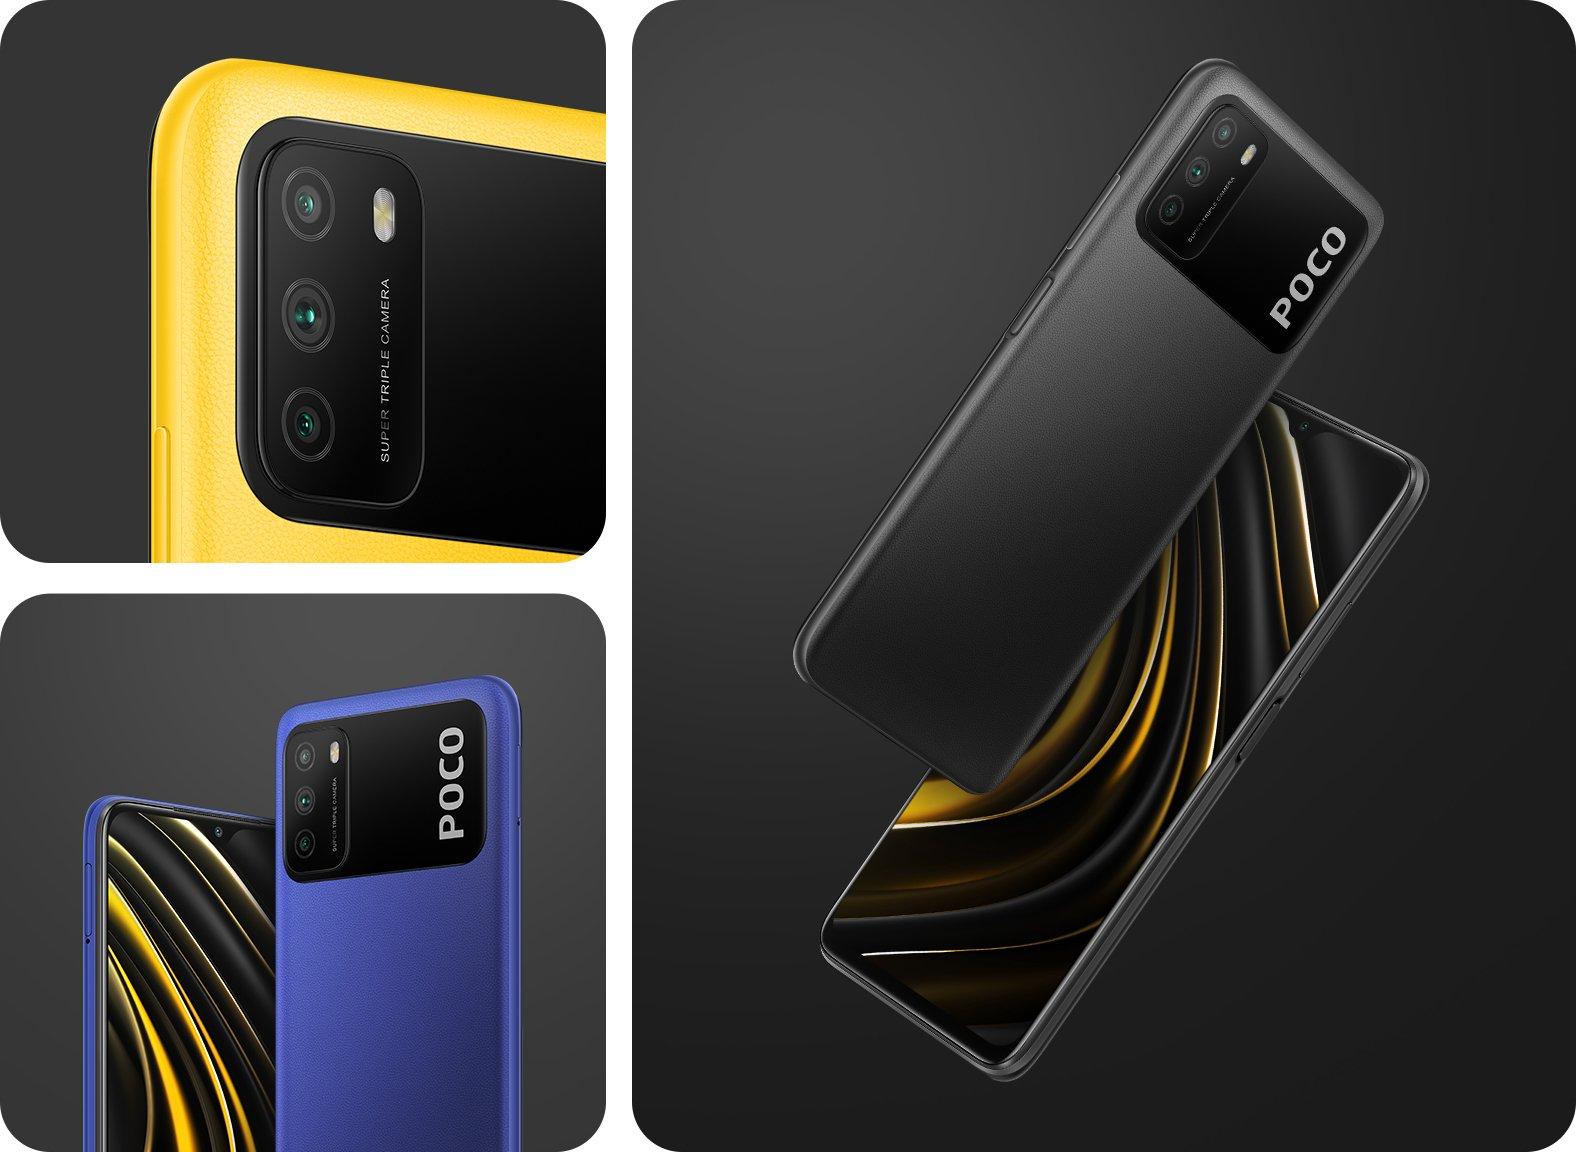 Анонс Poco M3 - бюджетный Xiaomi, но лидер по автономности Xiaomi  - poco_promo_picture5_1